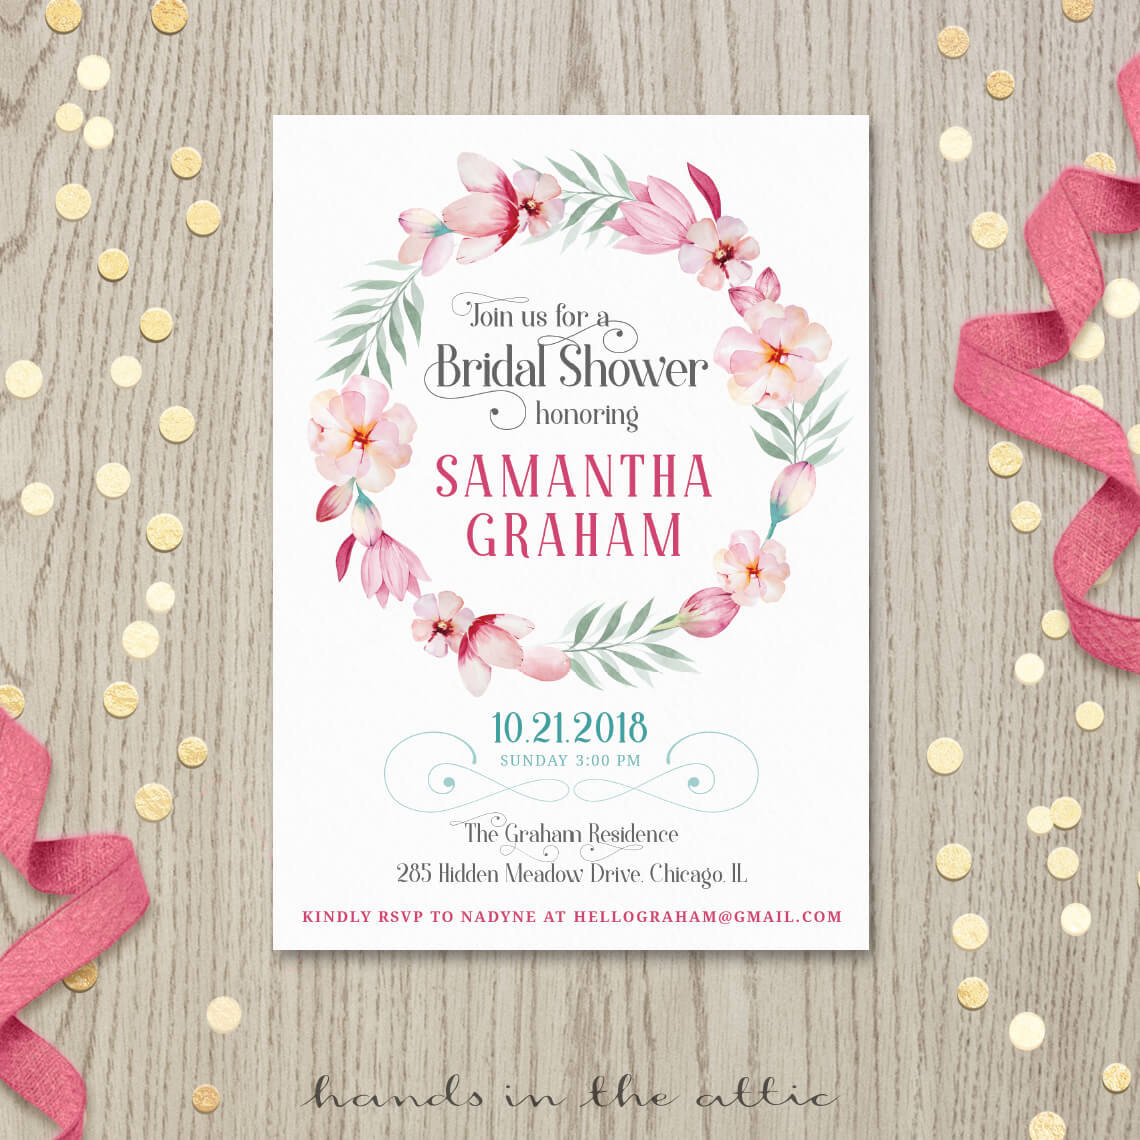 Pink Floral Bridal Shower Invitation | Printable Stationery ...